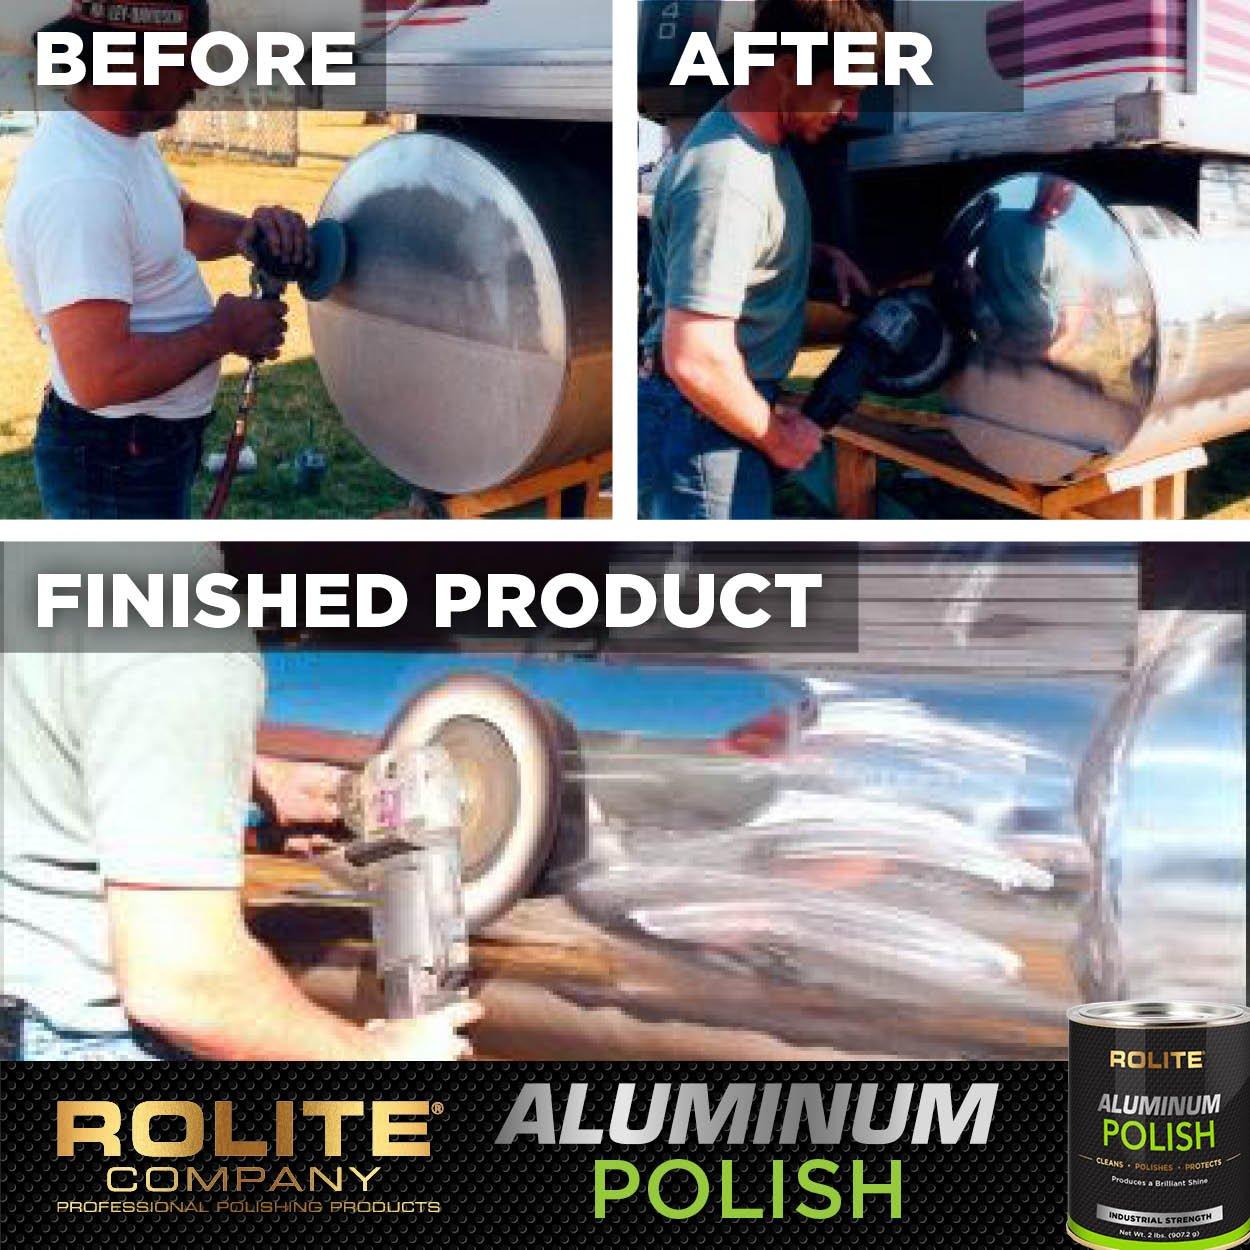 Rolite Aluminum Polish (1lb) for All Aluminum & Bare Metal Surfaces, Canoes, Jon Boats, Pontoons, Diamond Plate, Aluminum Non-Coated Wheels 6 Pack by Rolite (Image #5)